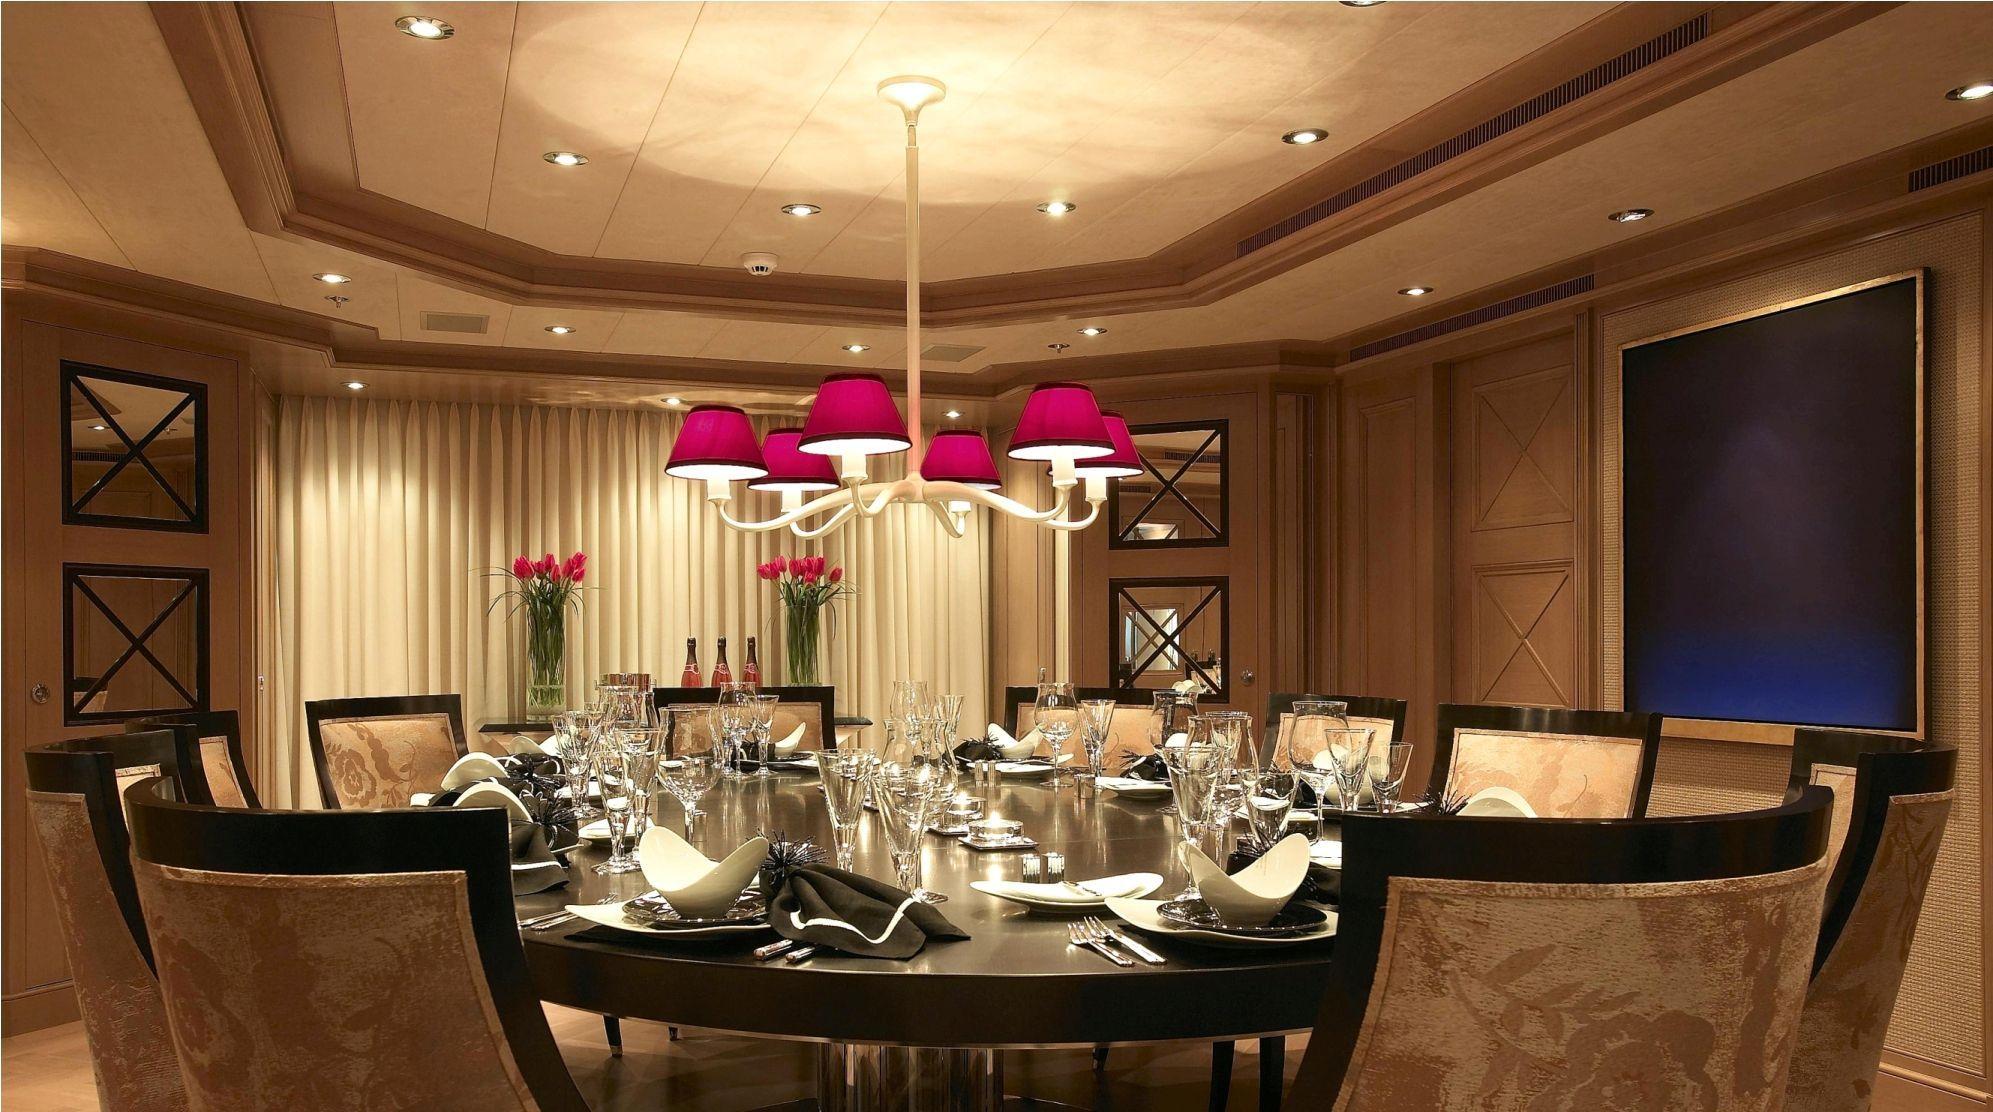 Room Dining Urban Lighting